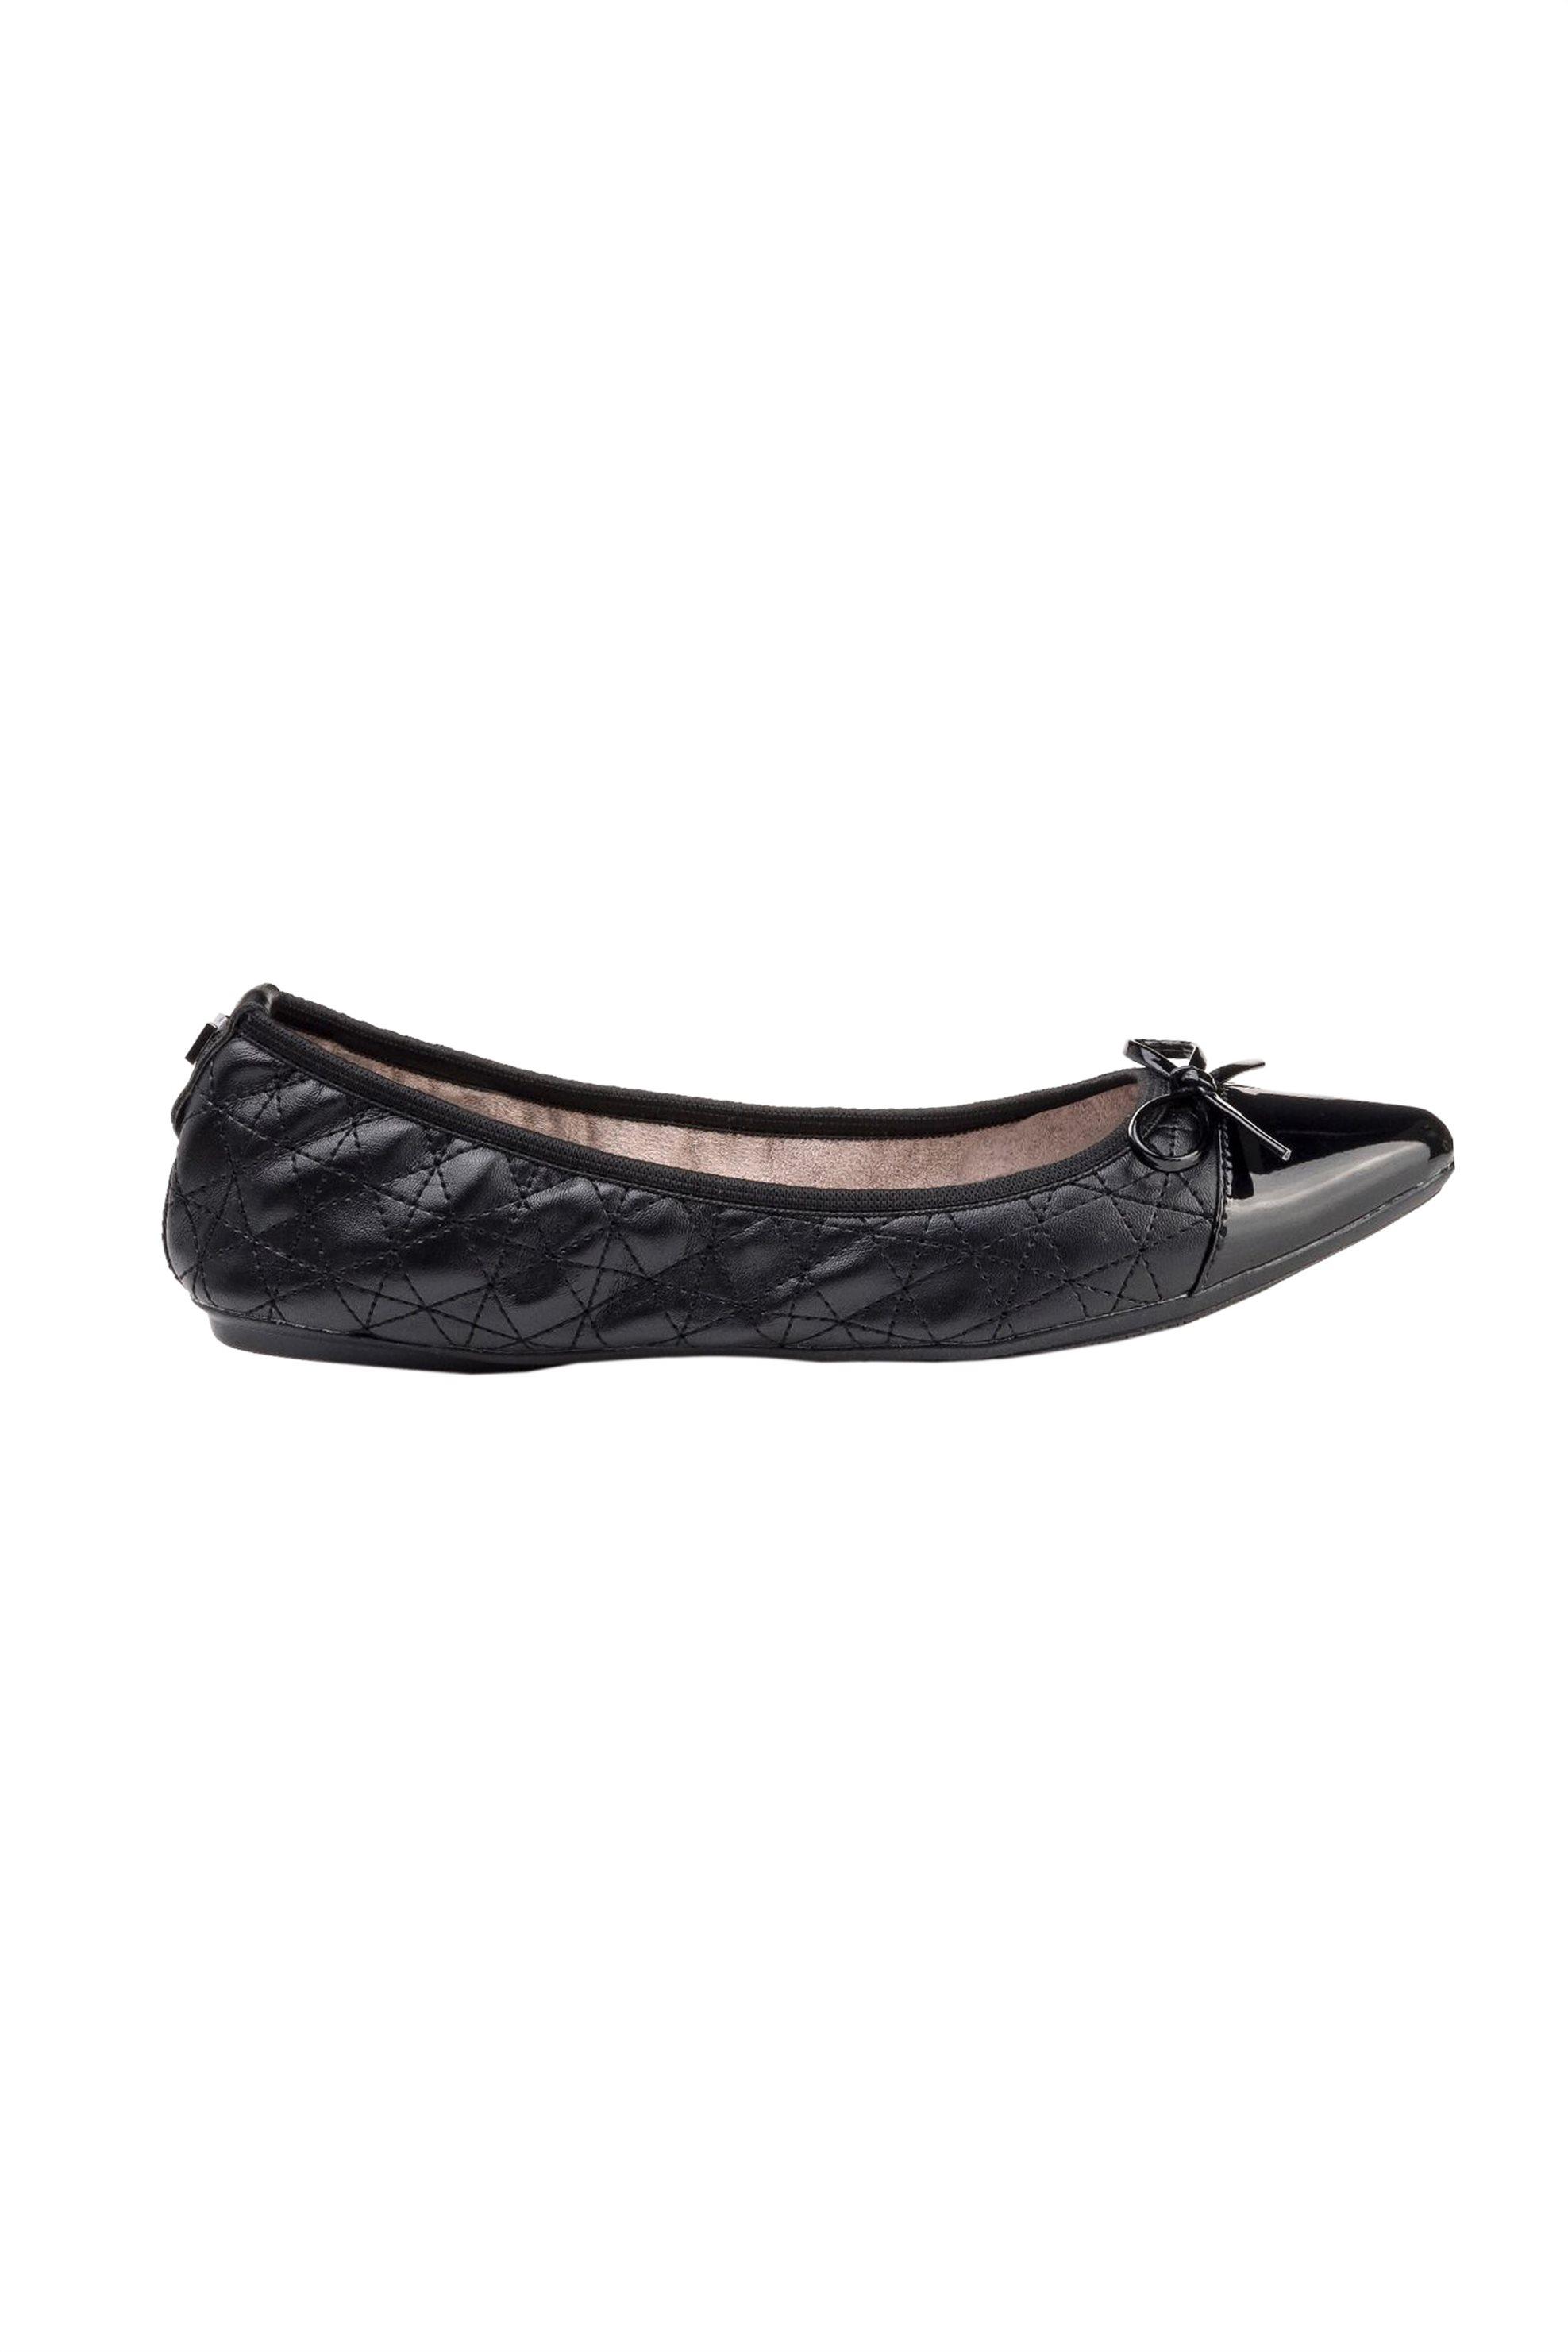 Butterfly Twists γυναικείες μπαλαρίνες Holly - 218894-HOLLY - Μαύρο